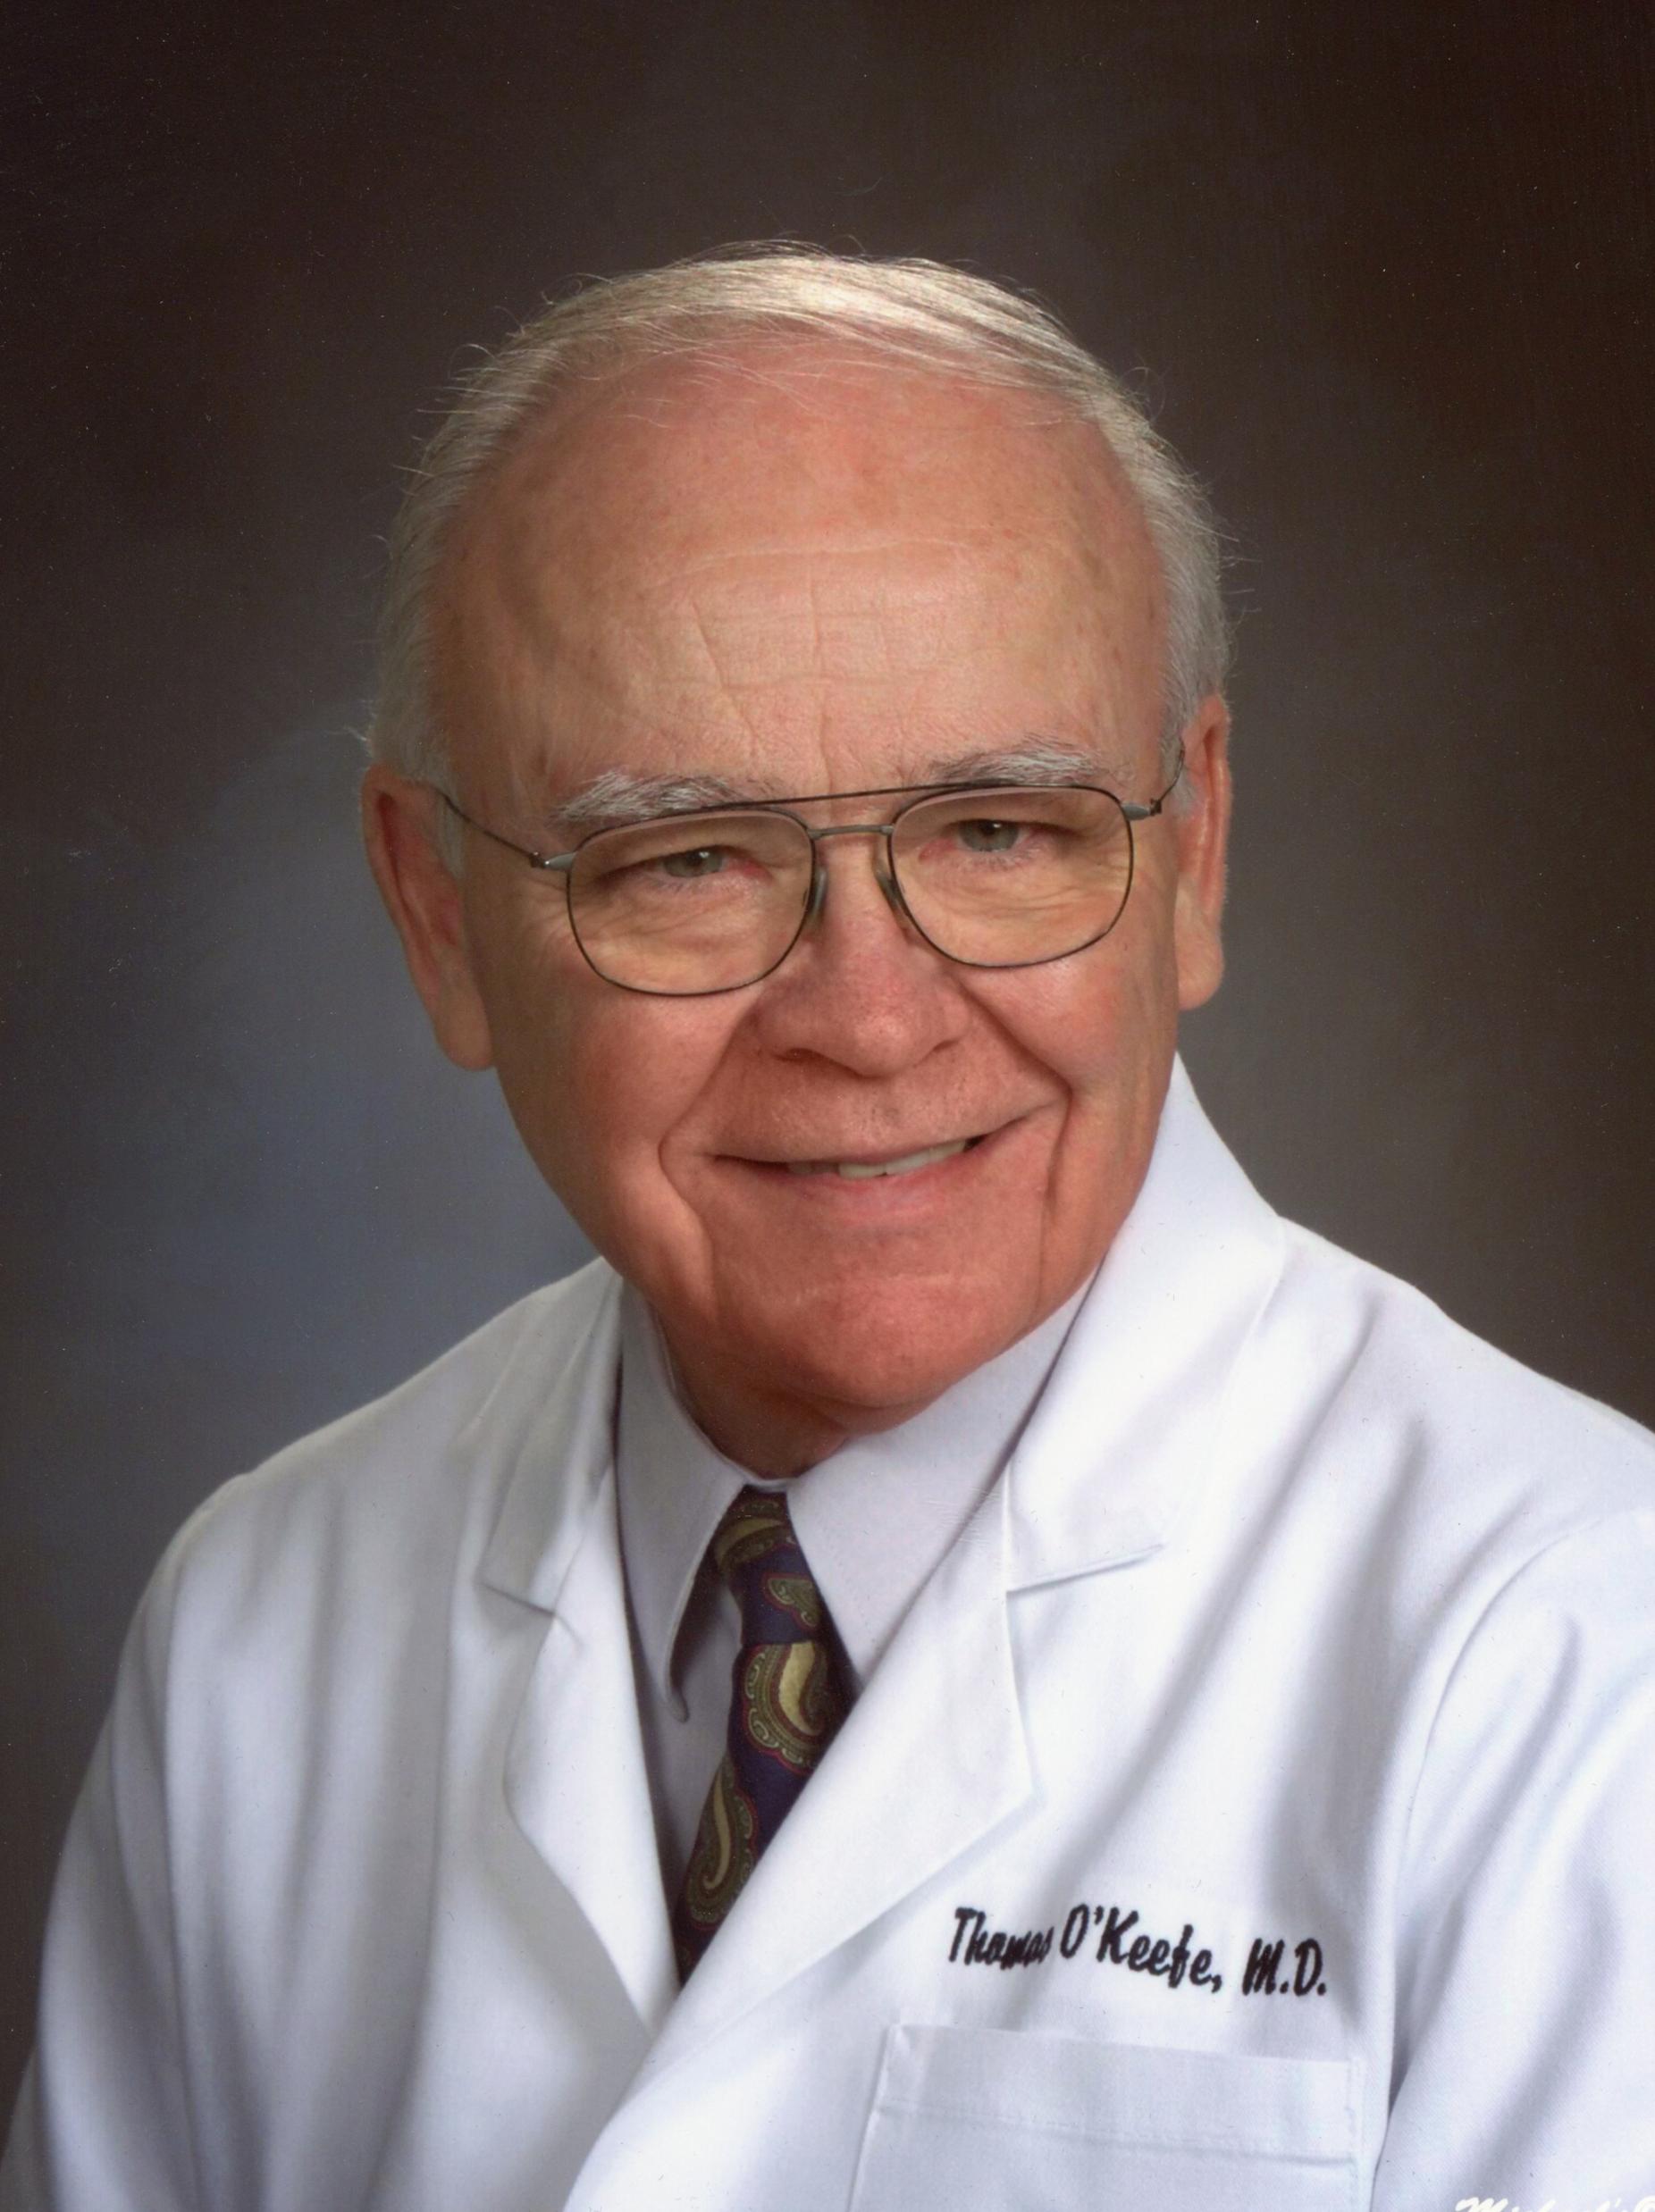 Thomas P. O'Keefe, M.D.